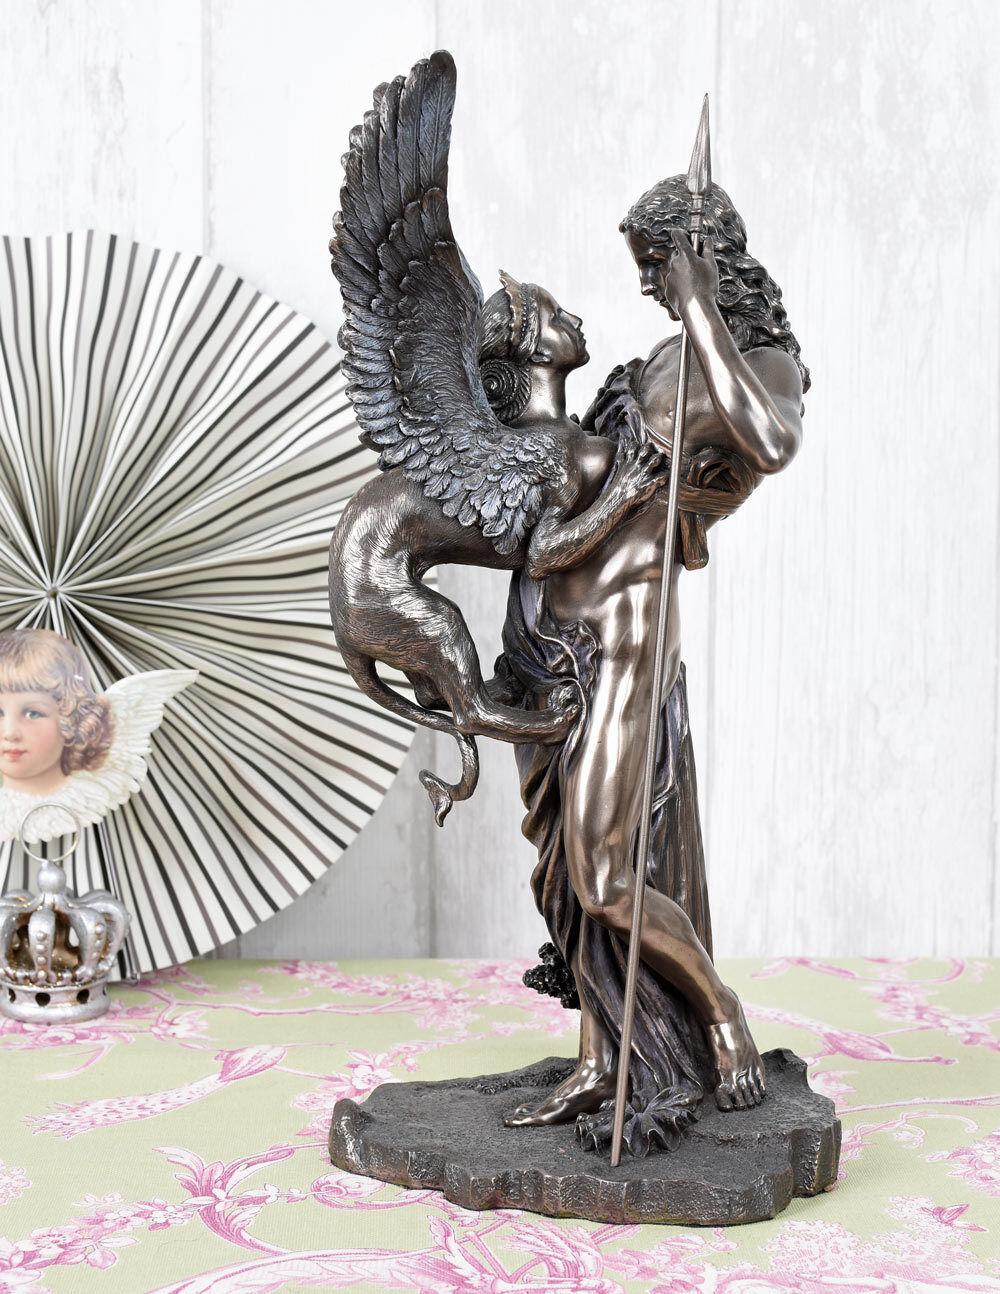 Sculpture Oedipe & Sphinx mythologie Grecque figure antique style Veronese signé